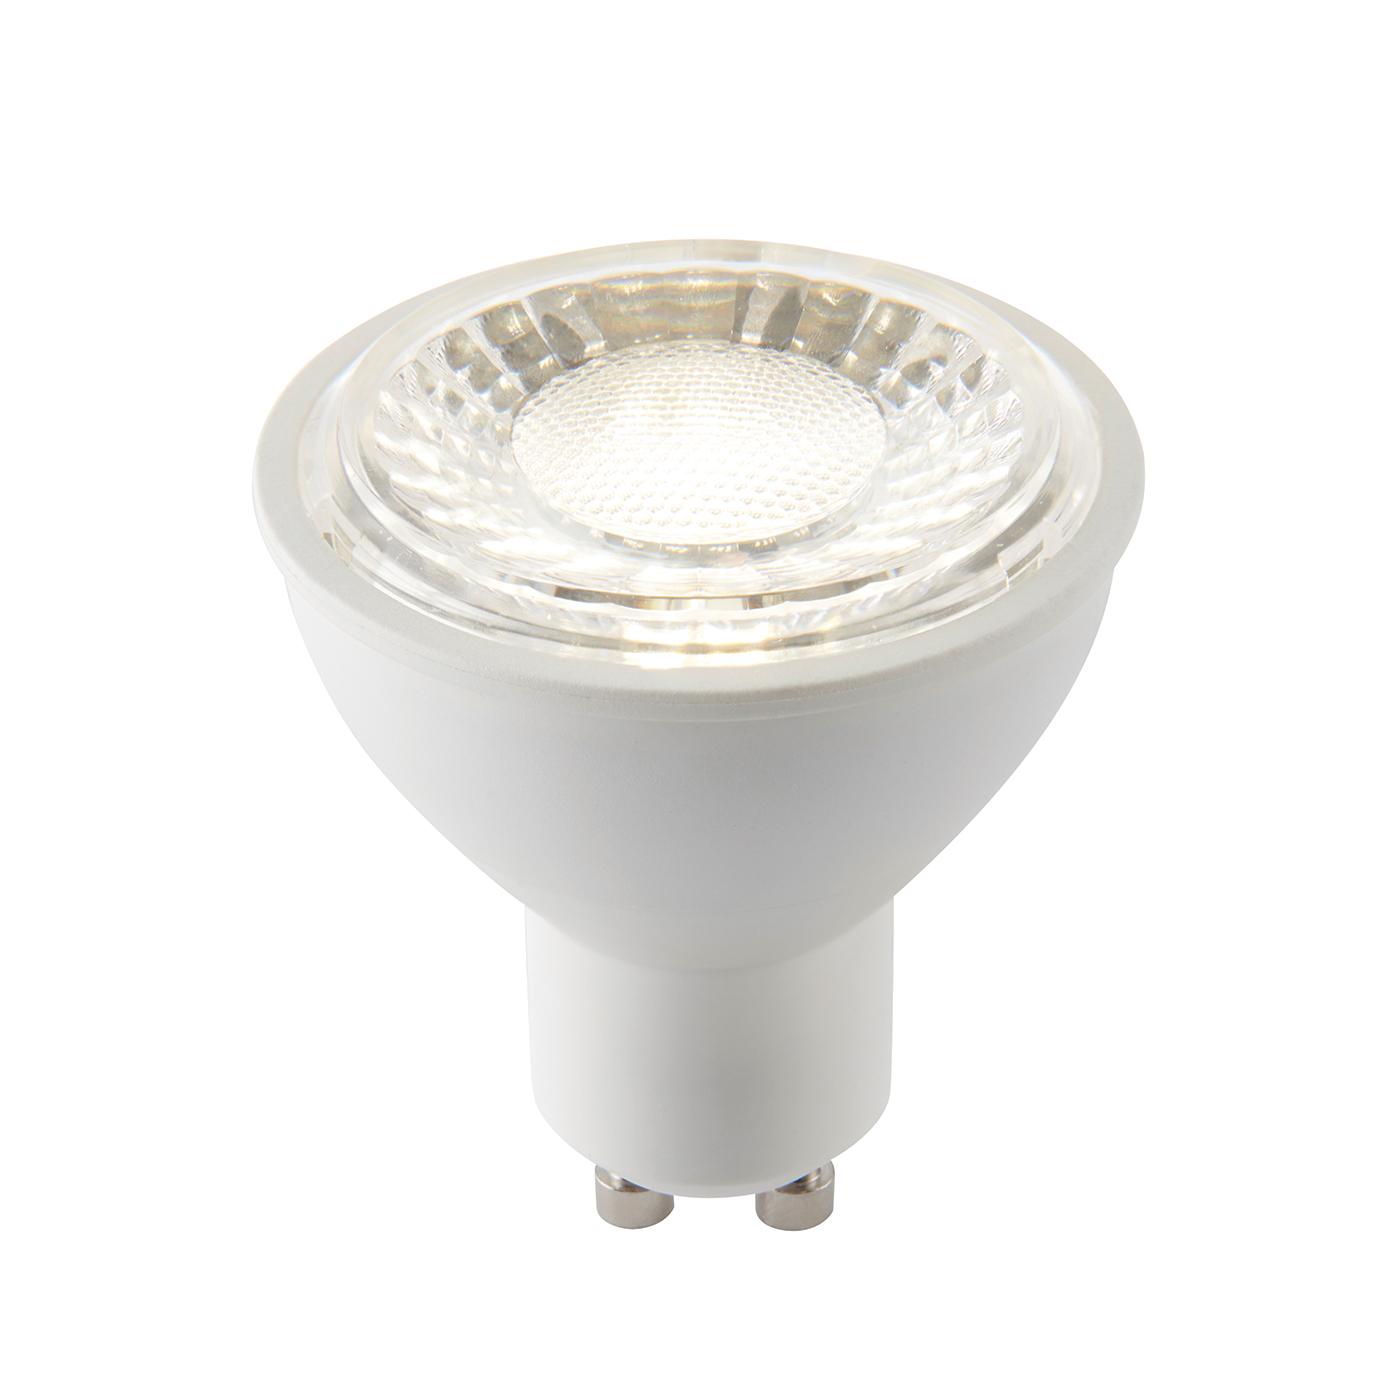 Endon 70056 LED SMD Lamp 4000K GU10 7W